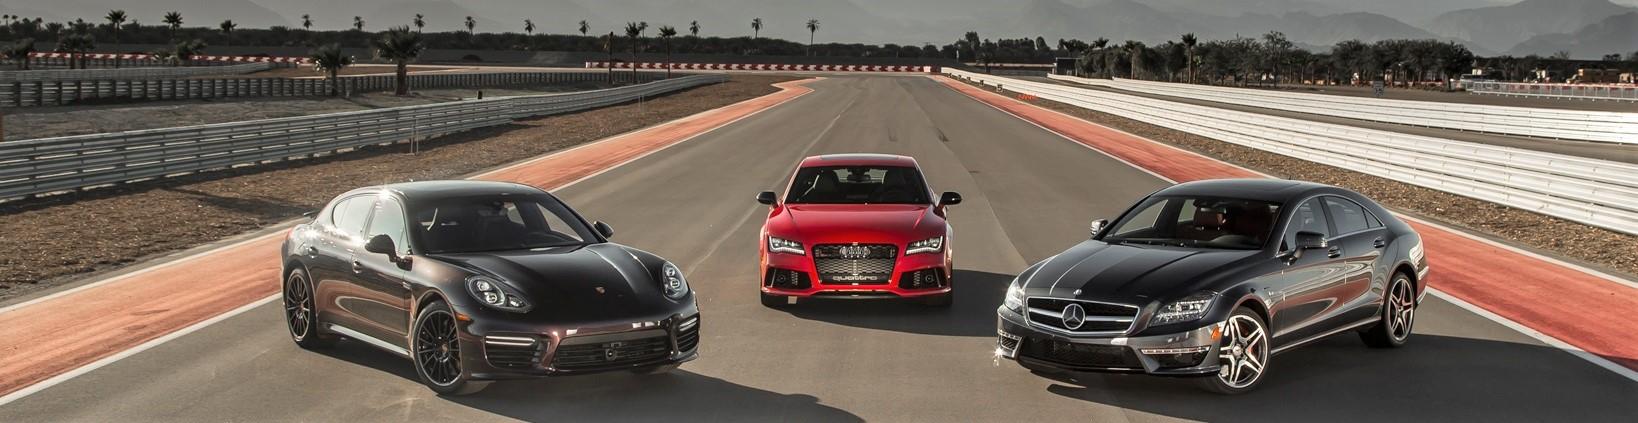 Porsche-Panamera-Audi-RS7-Mercedes-Benz-CLS63-AMG (2).jpg